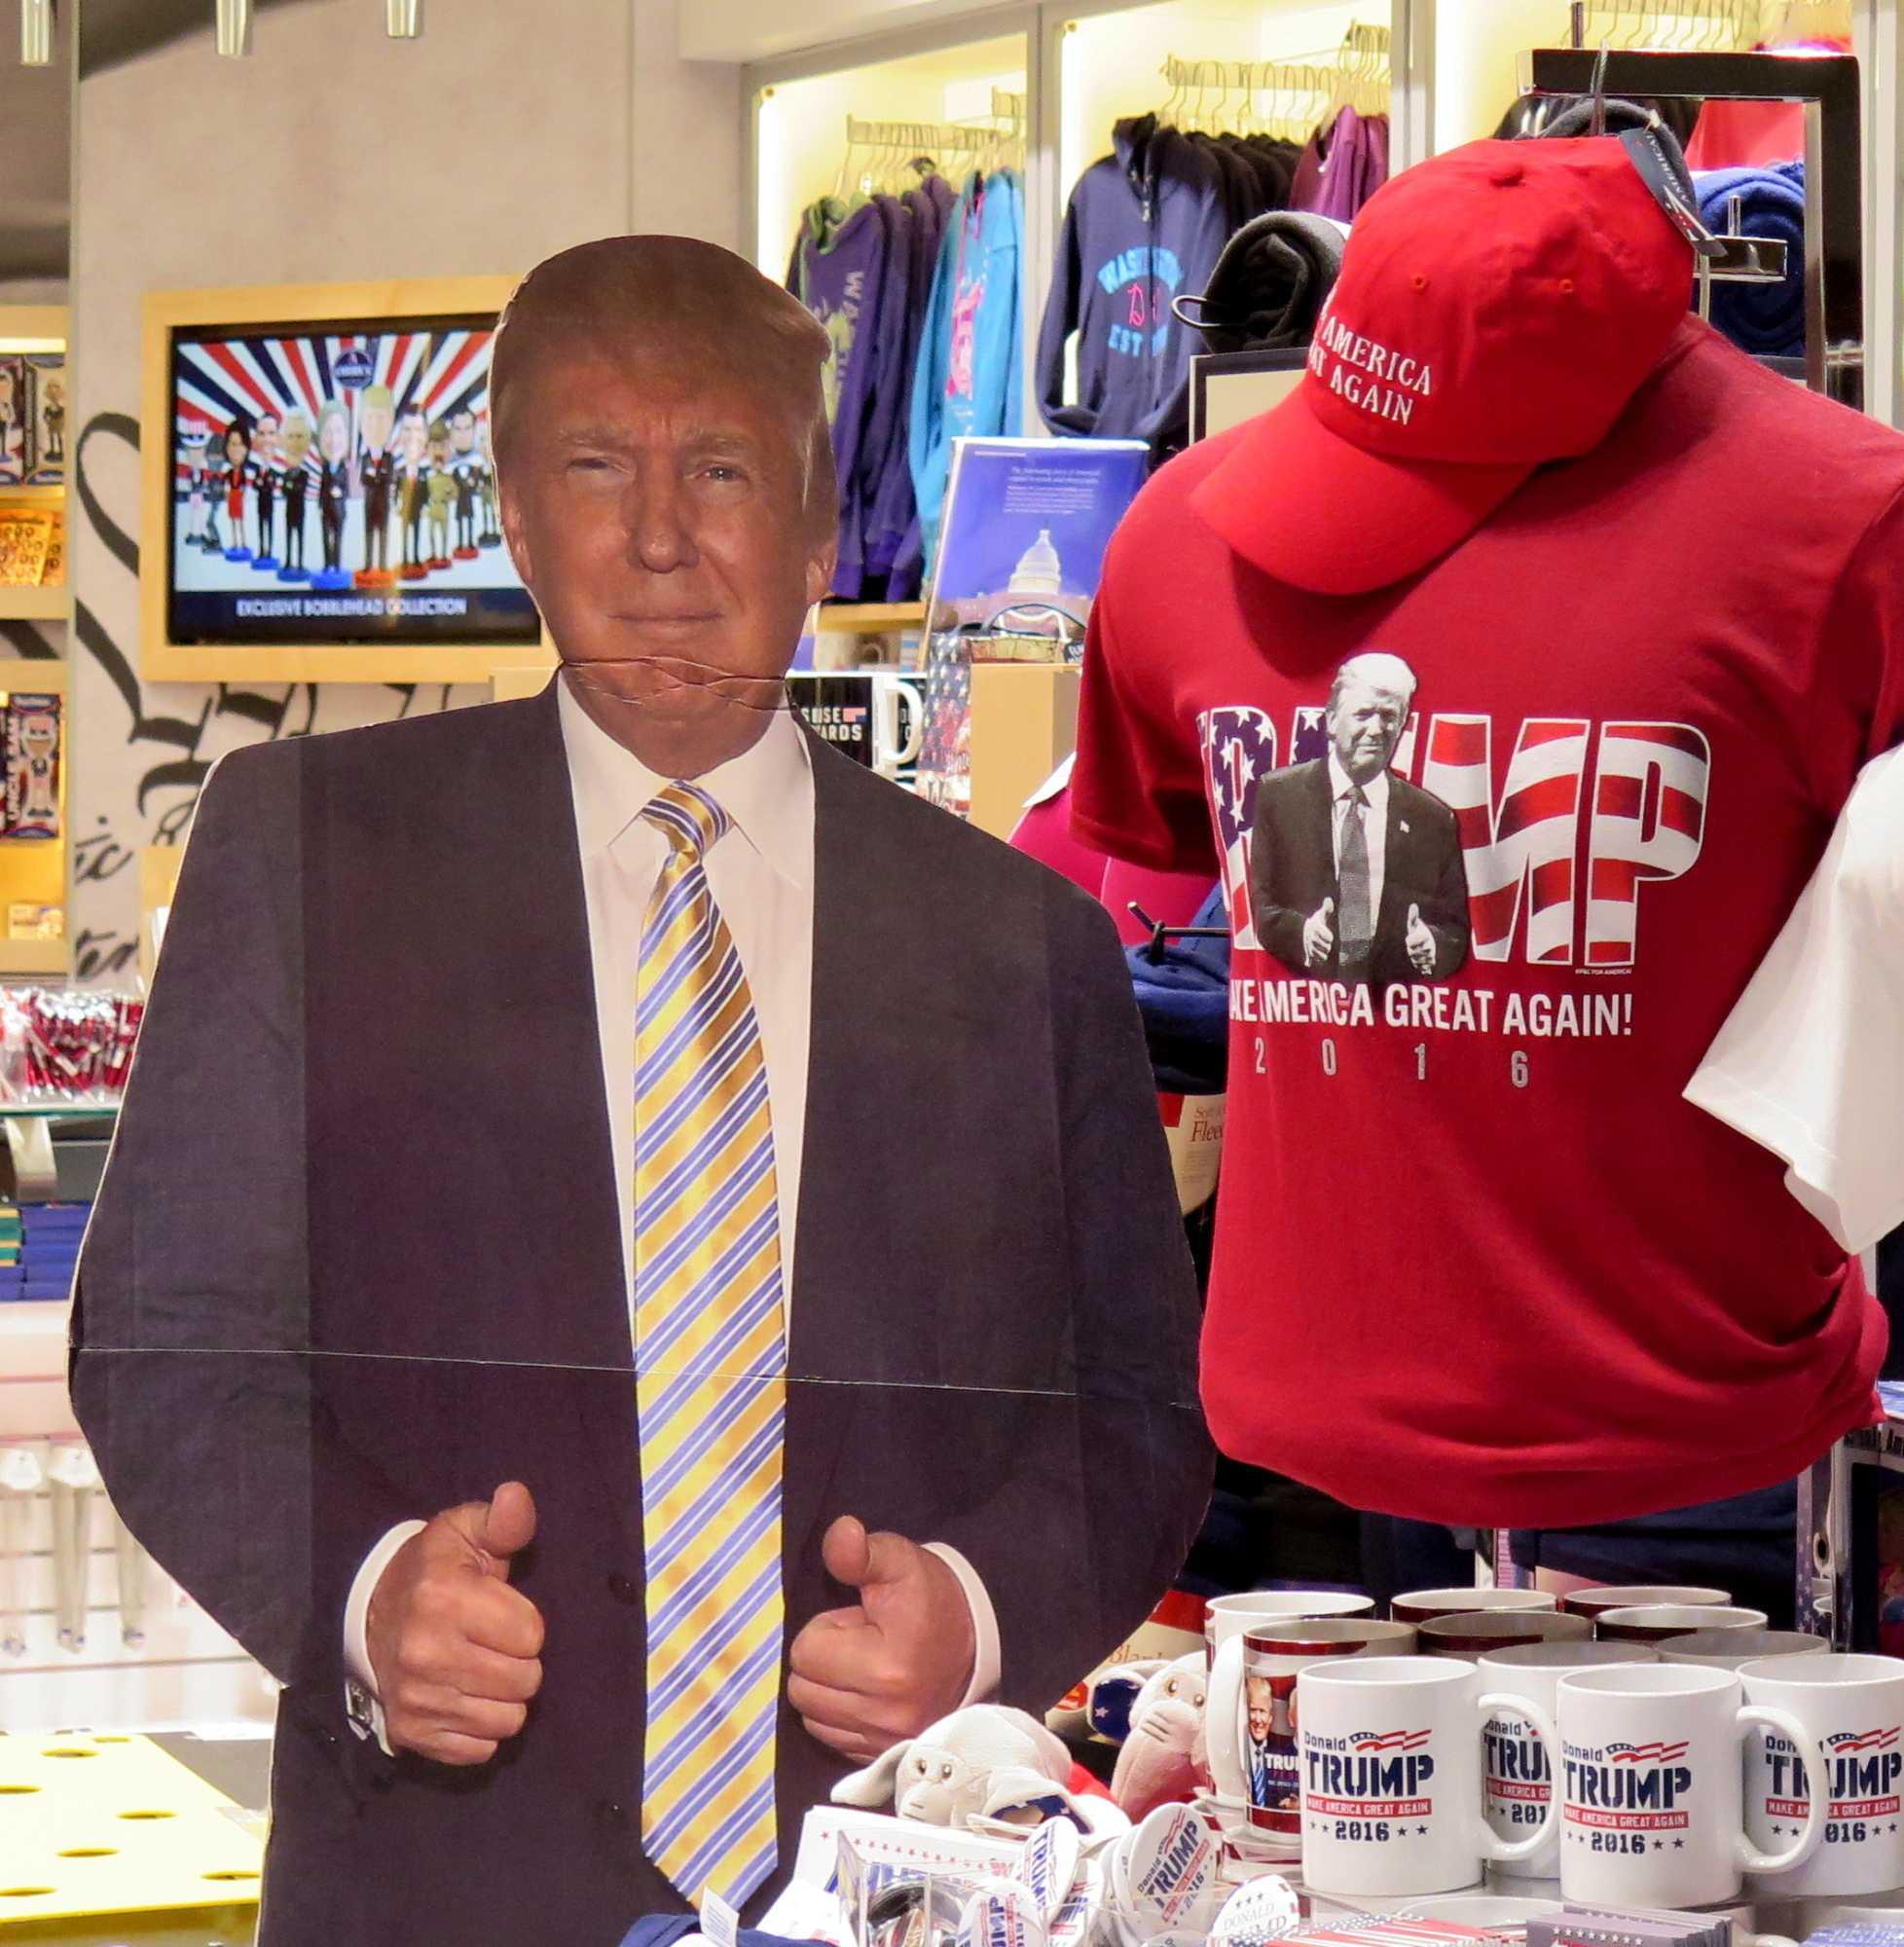 Pappfigur Trumps neben Trump-T-Shirt